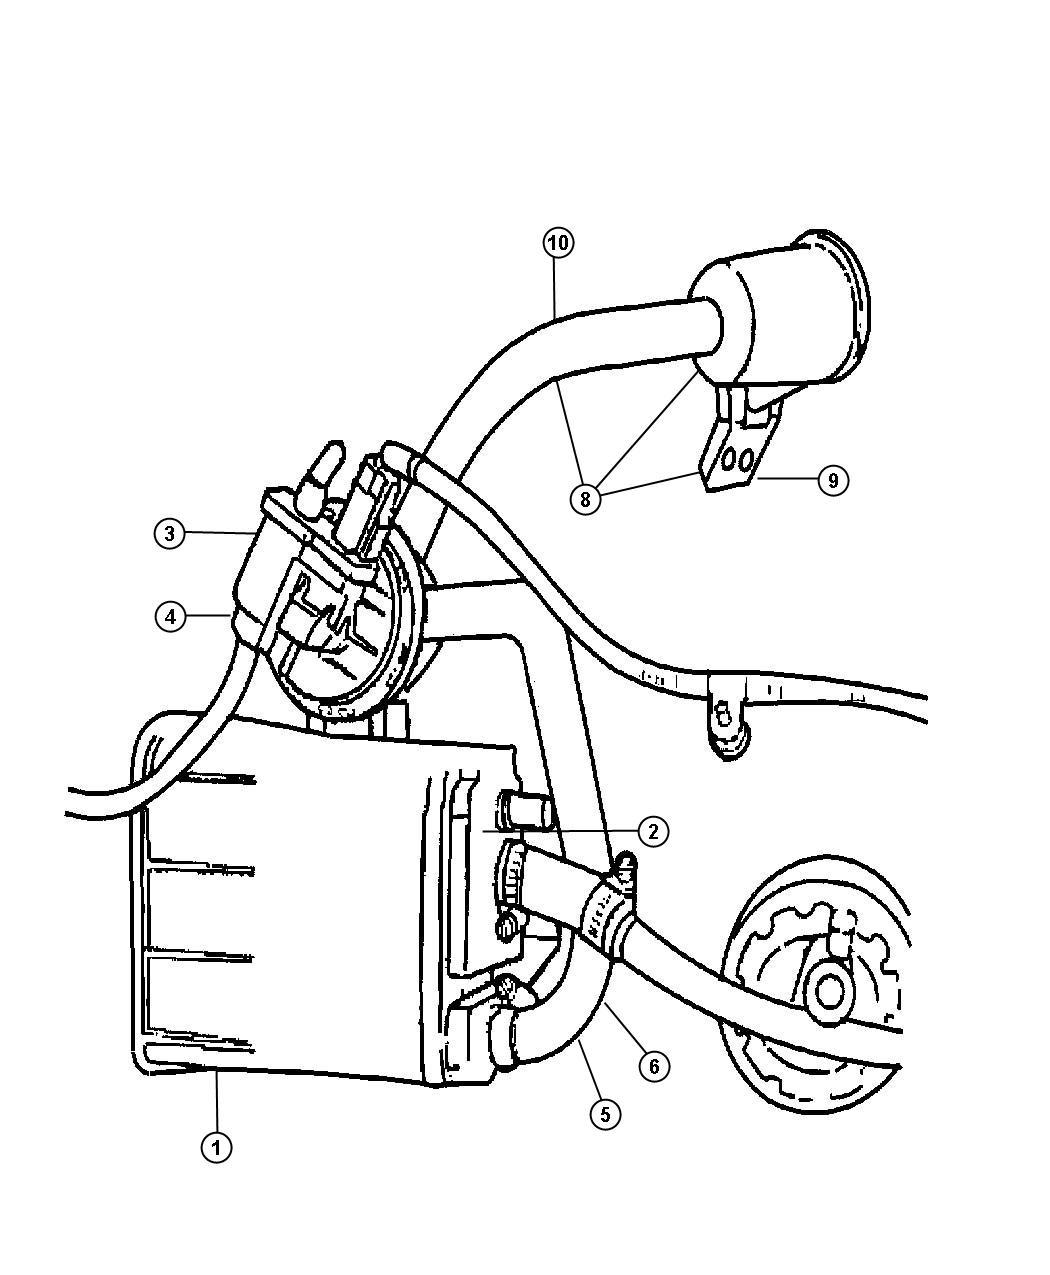 Dodge Stratus Vacuum Canister And Leak Detection Pump